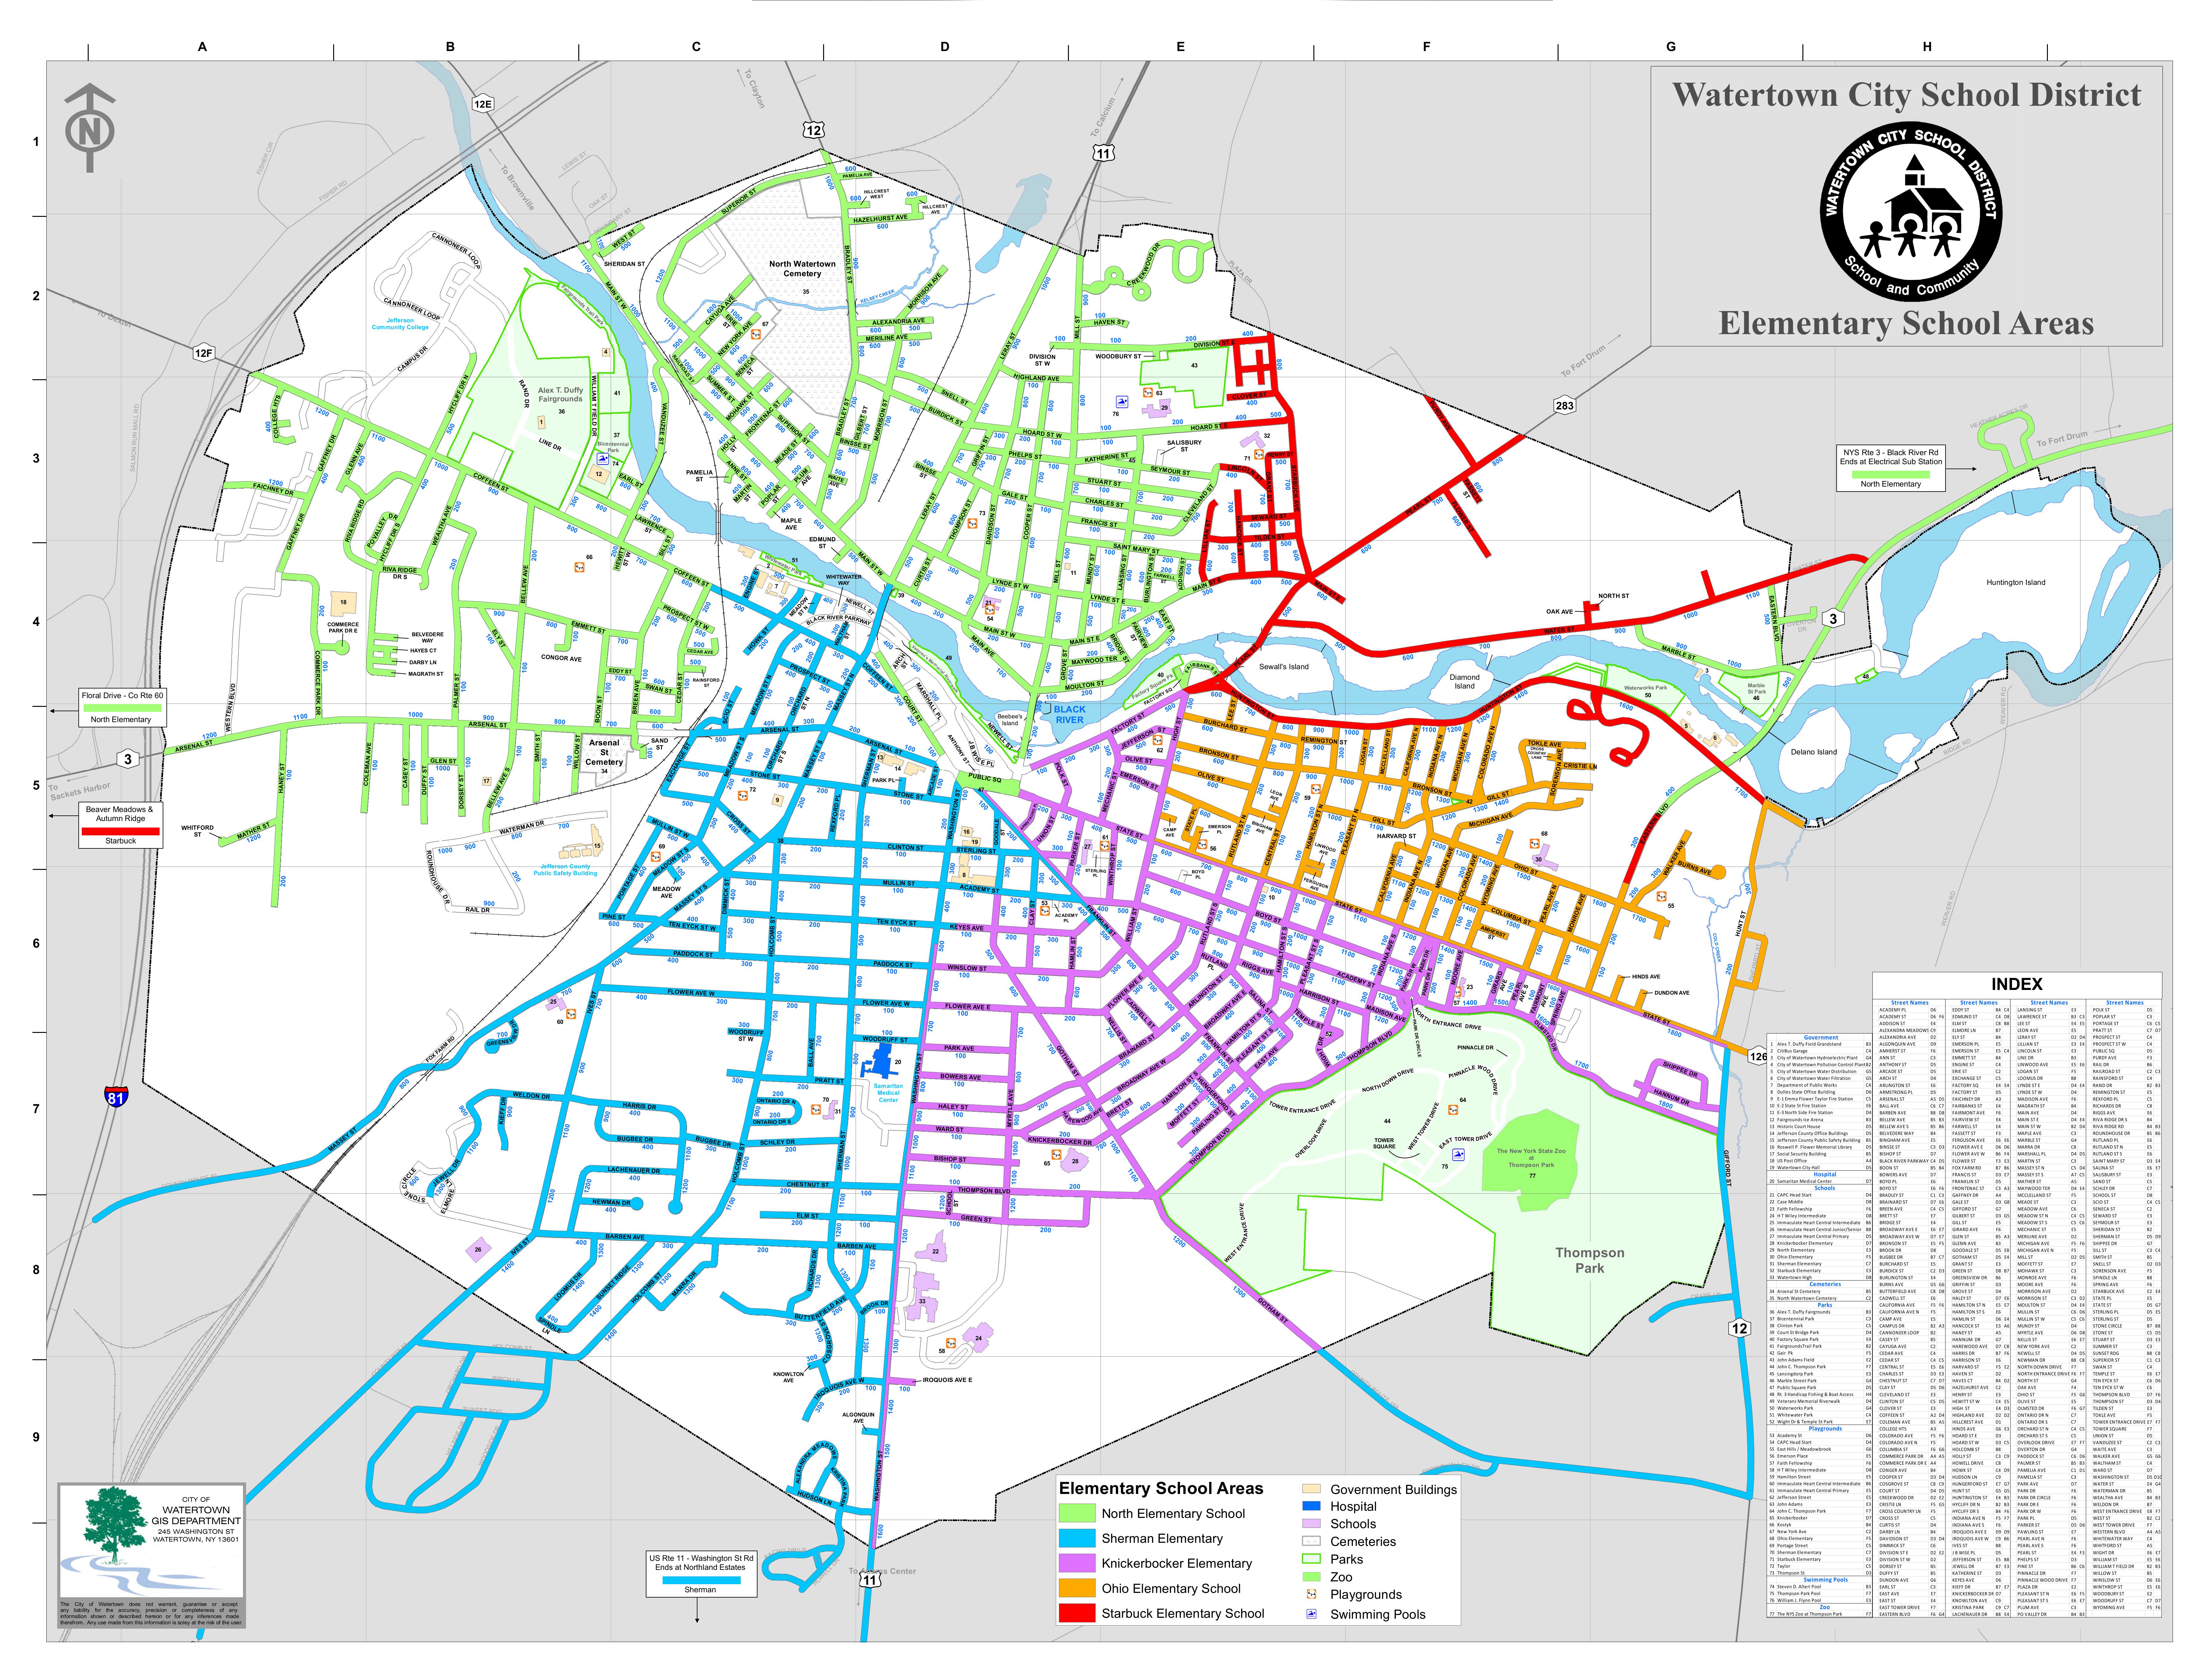 map - Watertown City School District   manualzz.com